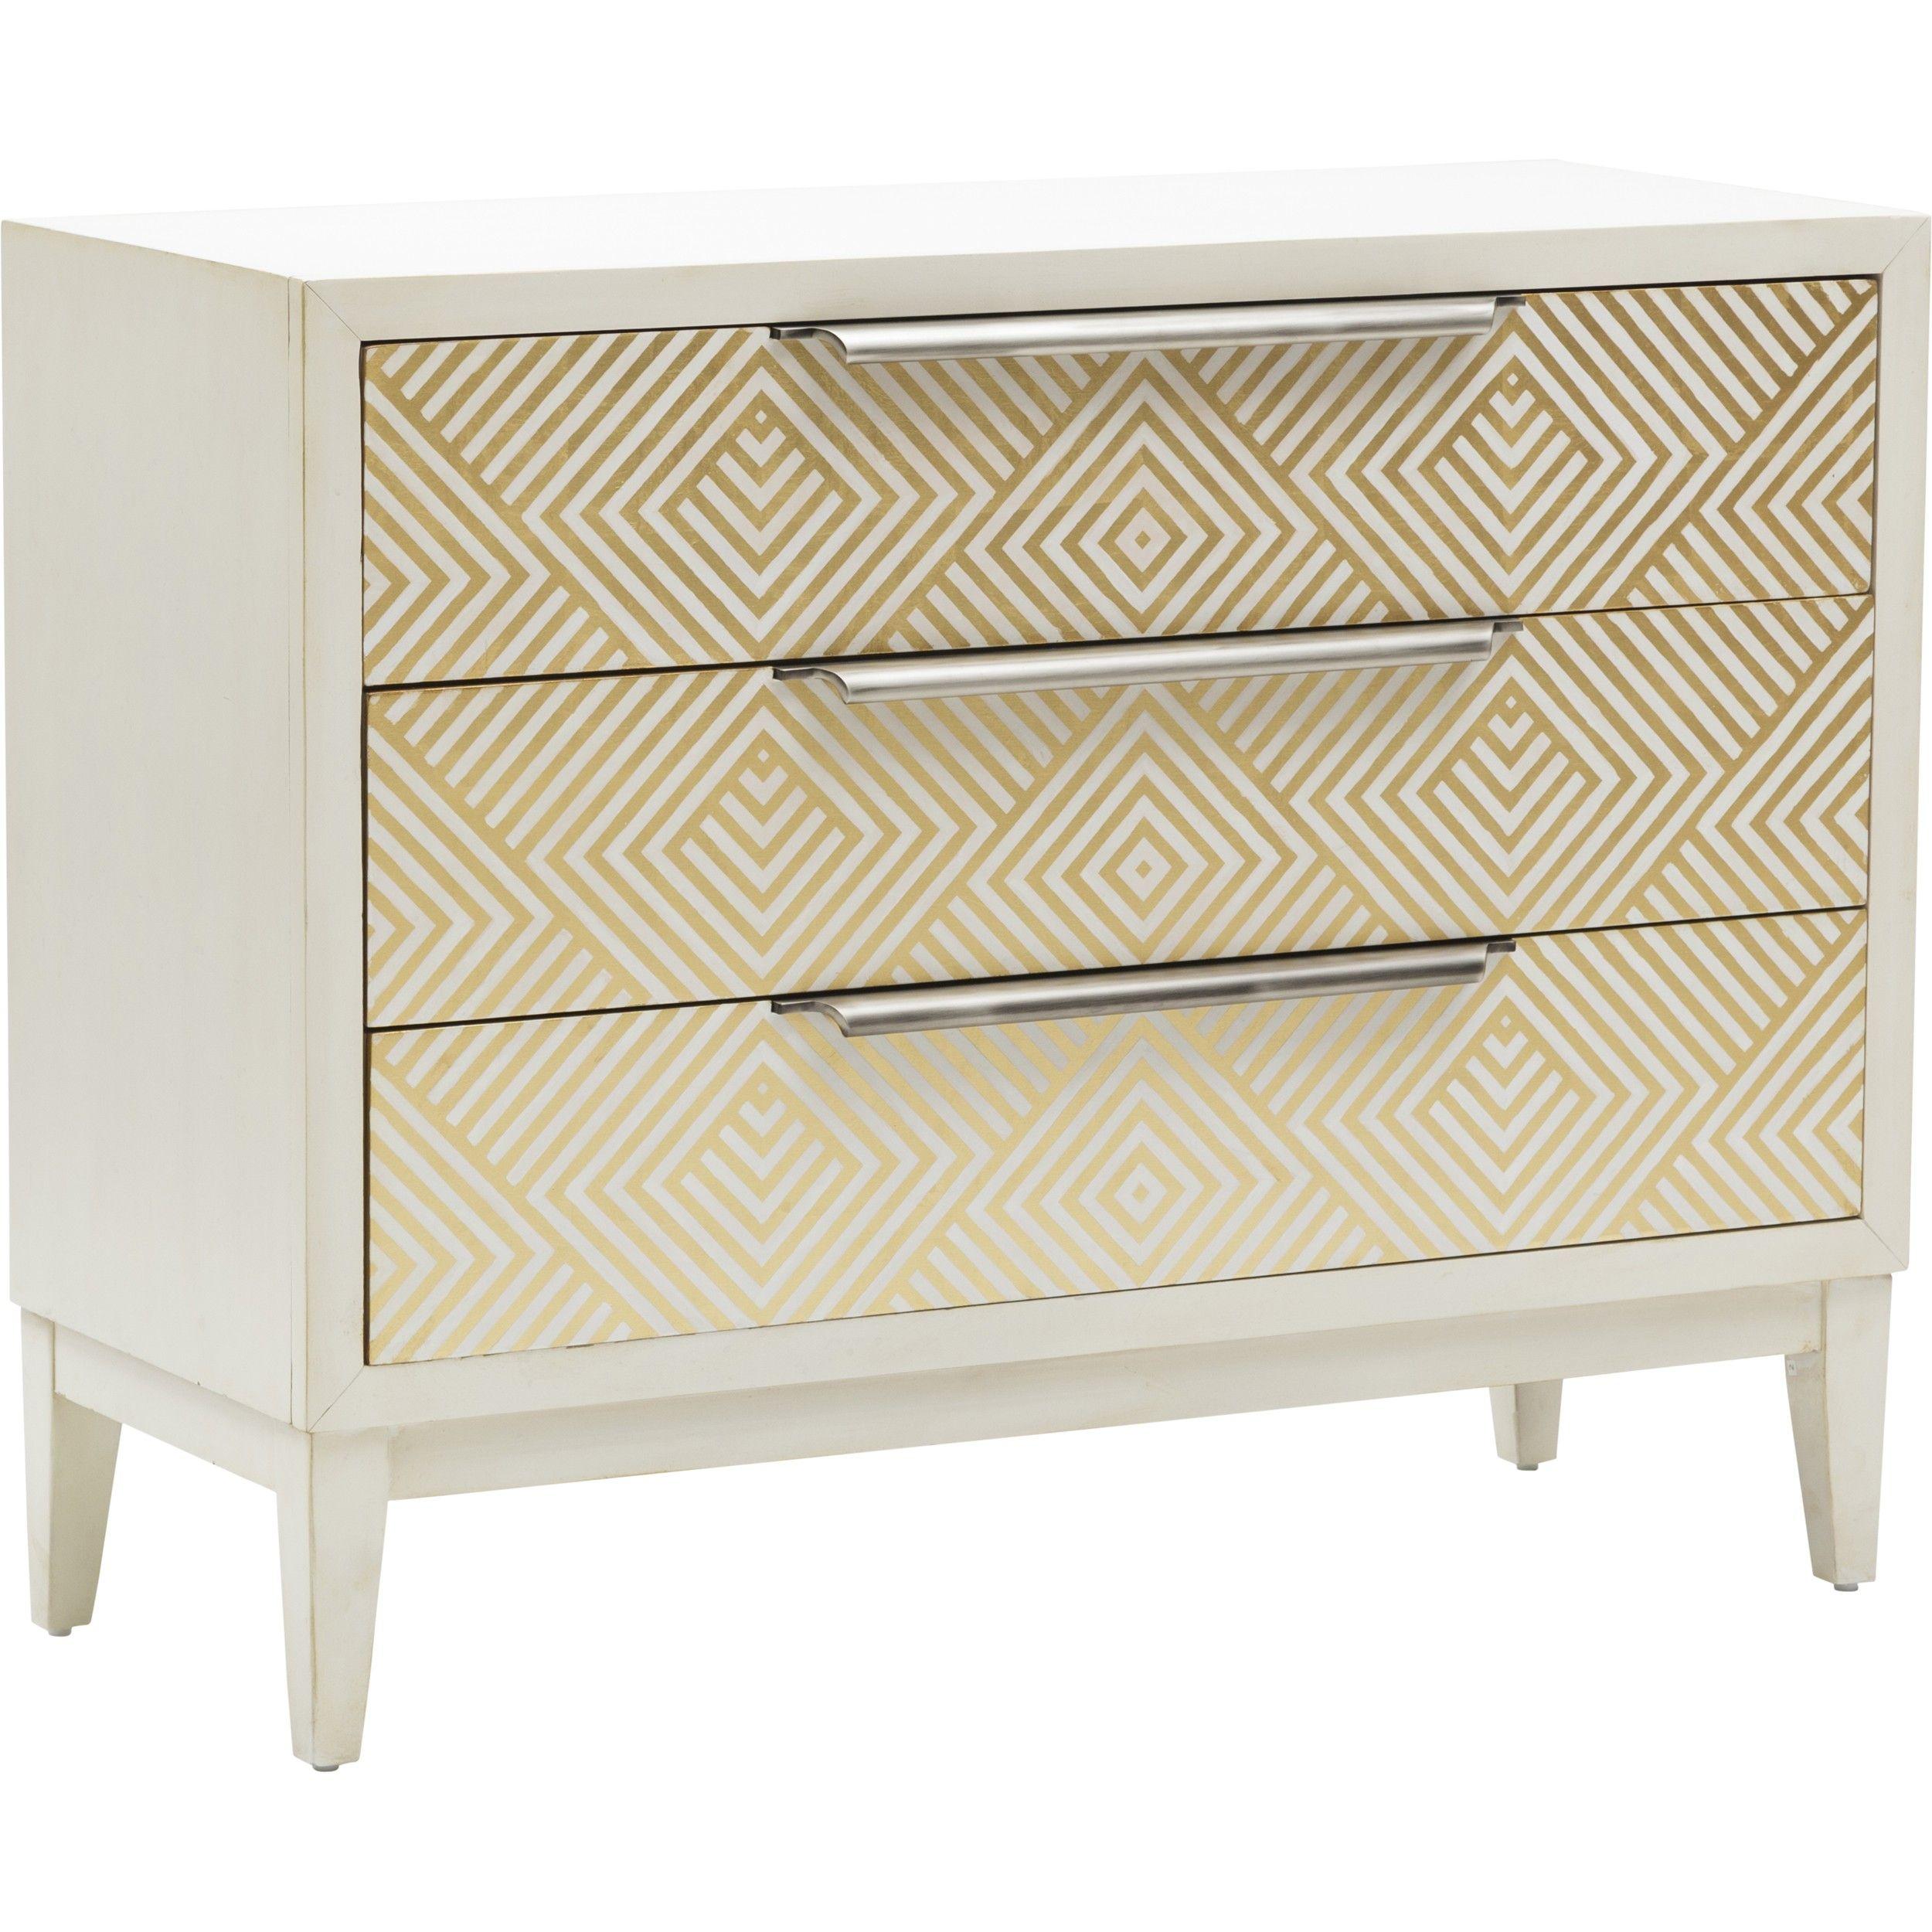 Effervescent chest furniture storage bedroom bedroom